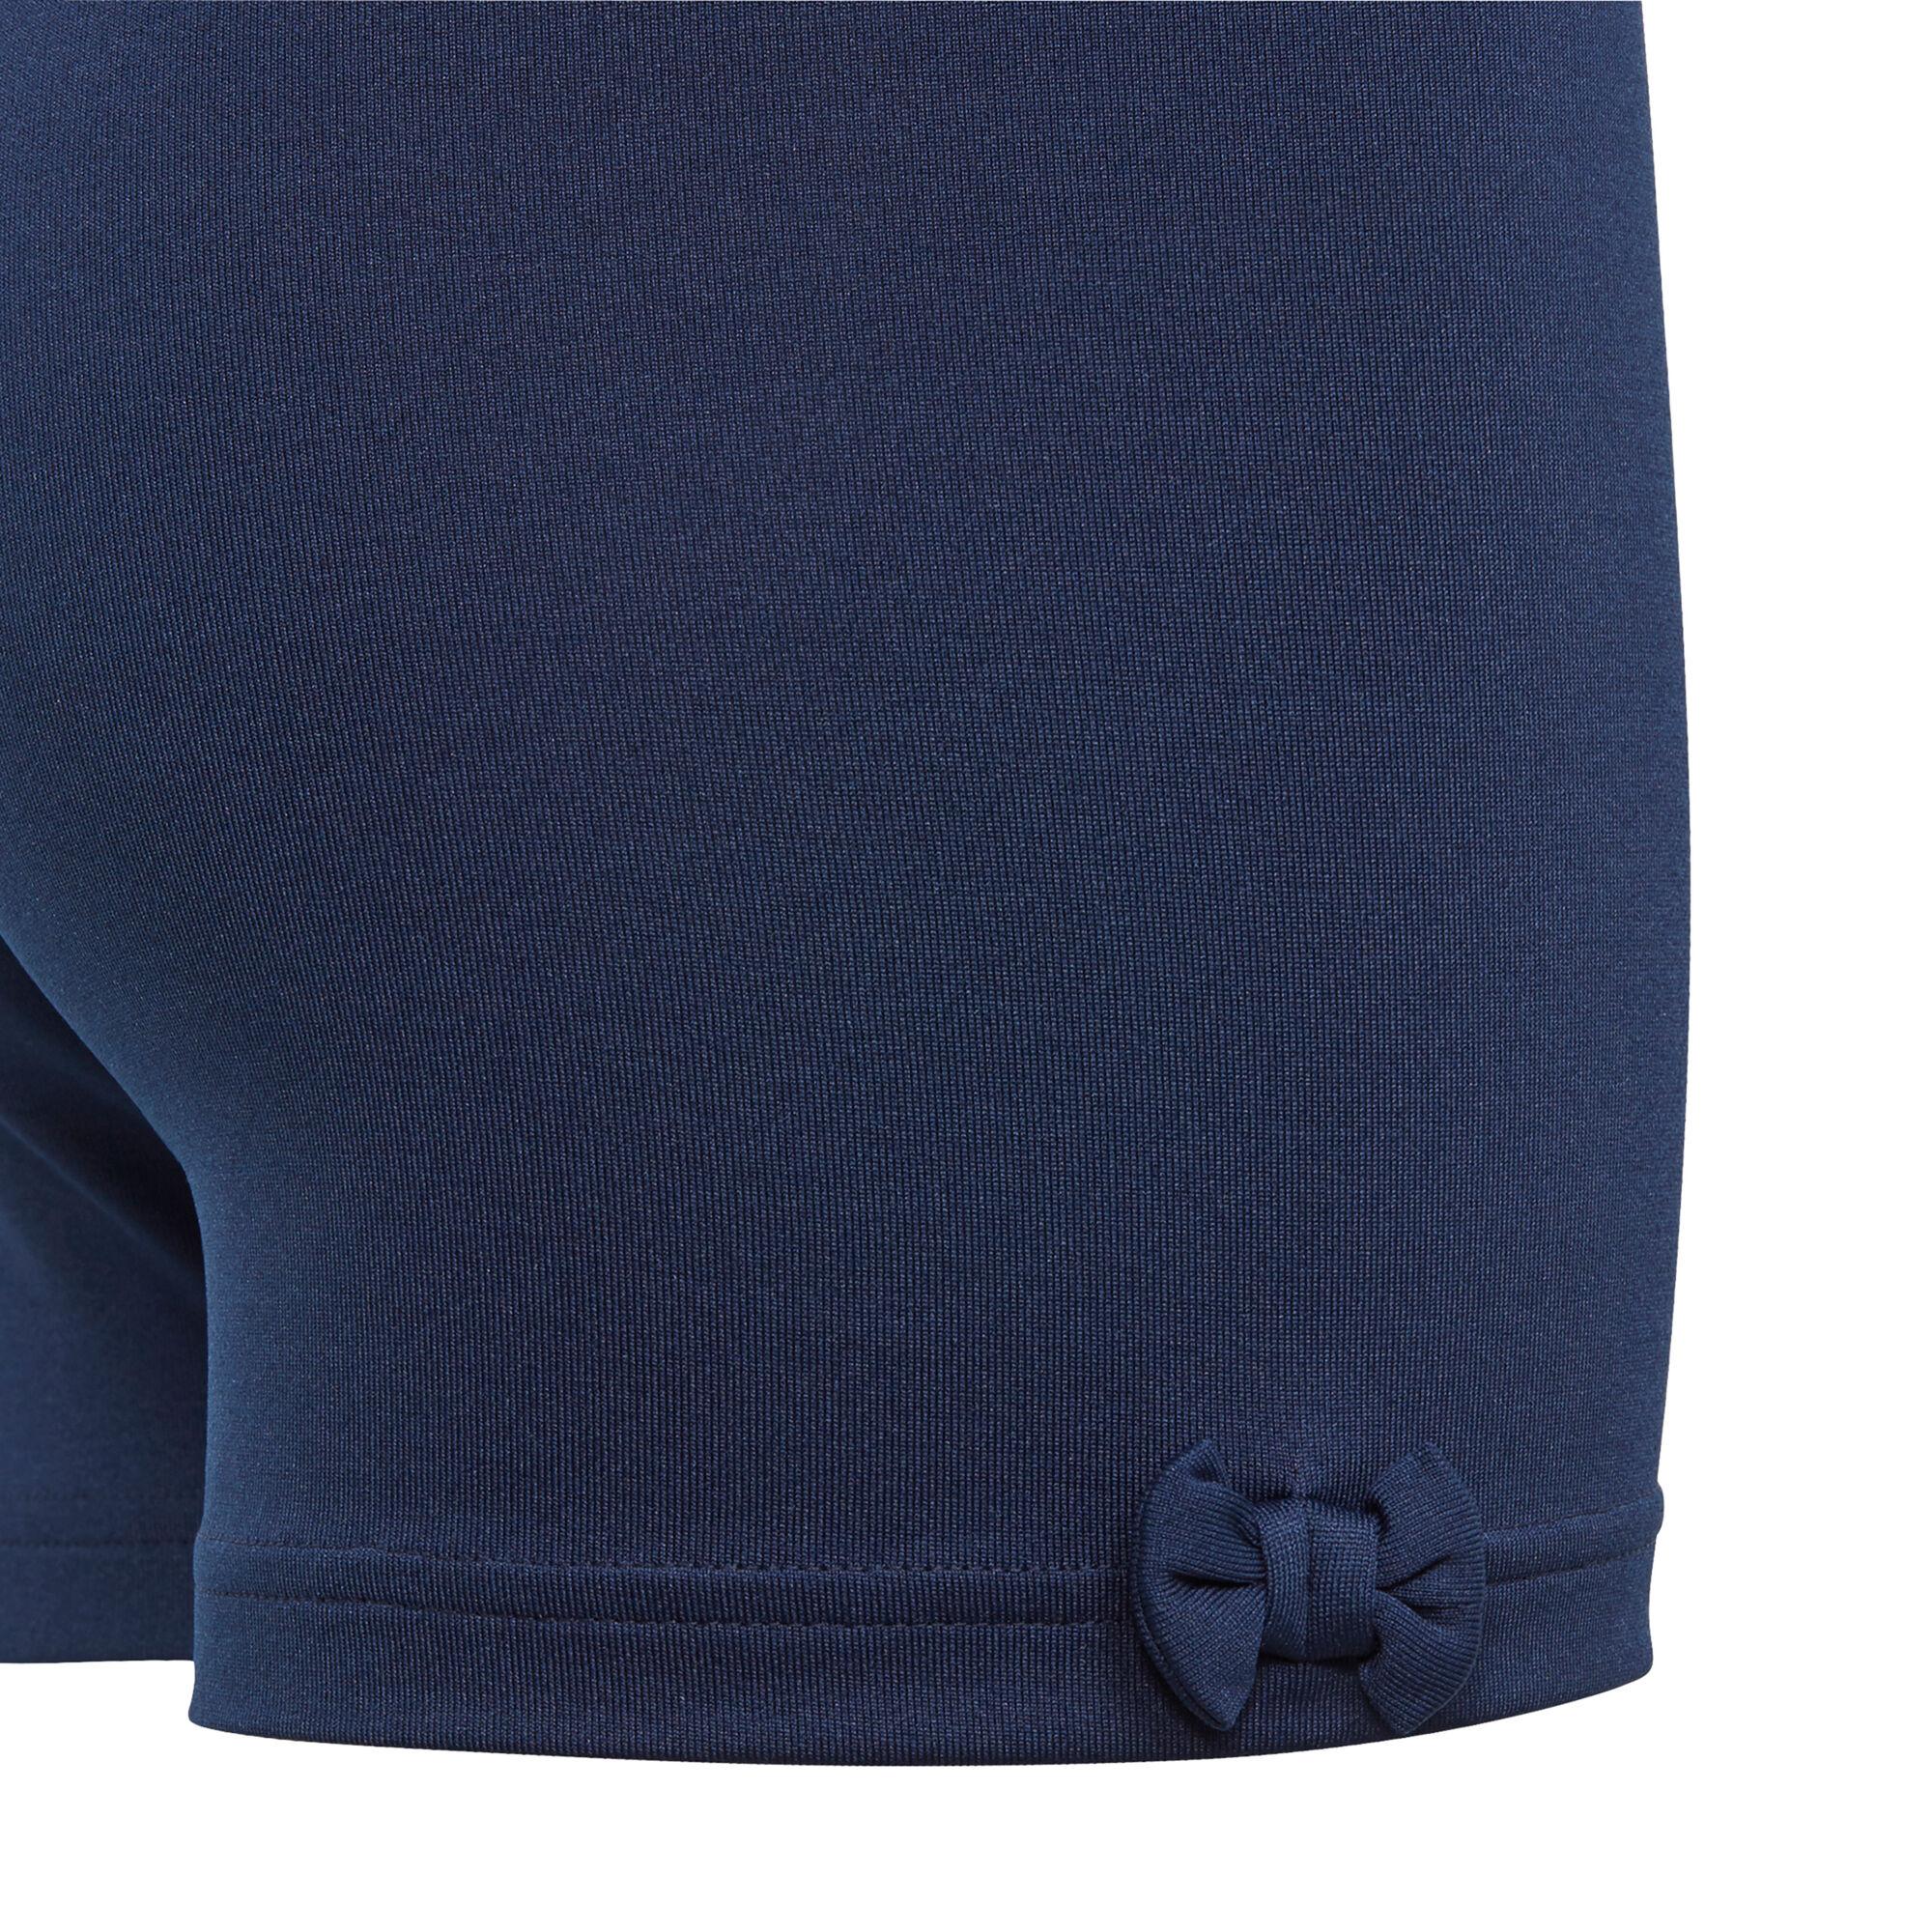 360e27acfdd adidas Ribbon Kjole Pige - Mørkeblå, Hvid køb online | Tennis-Point